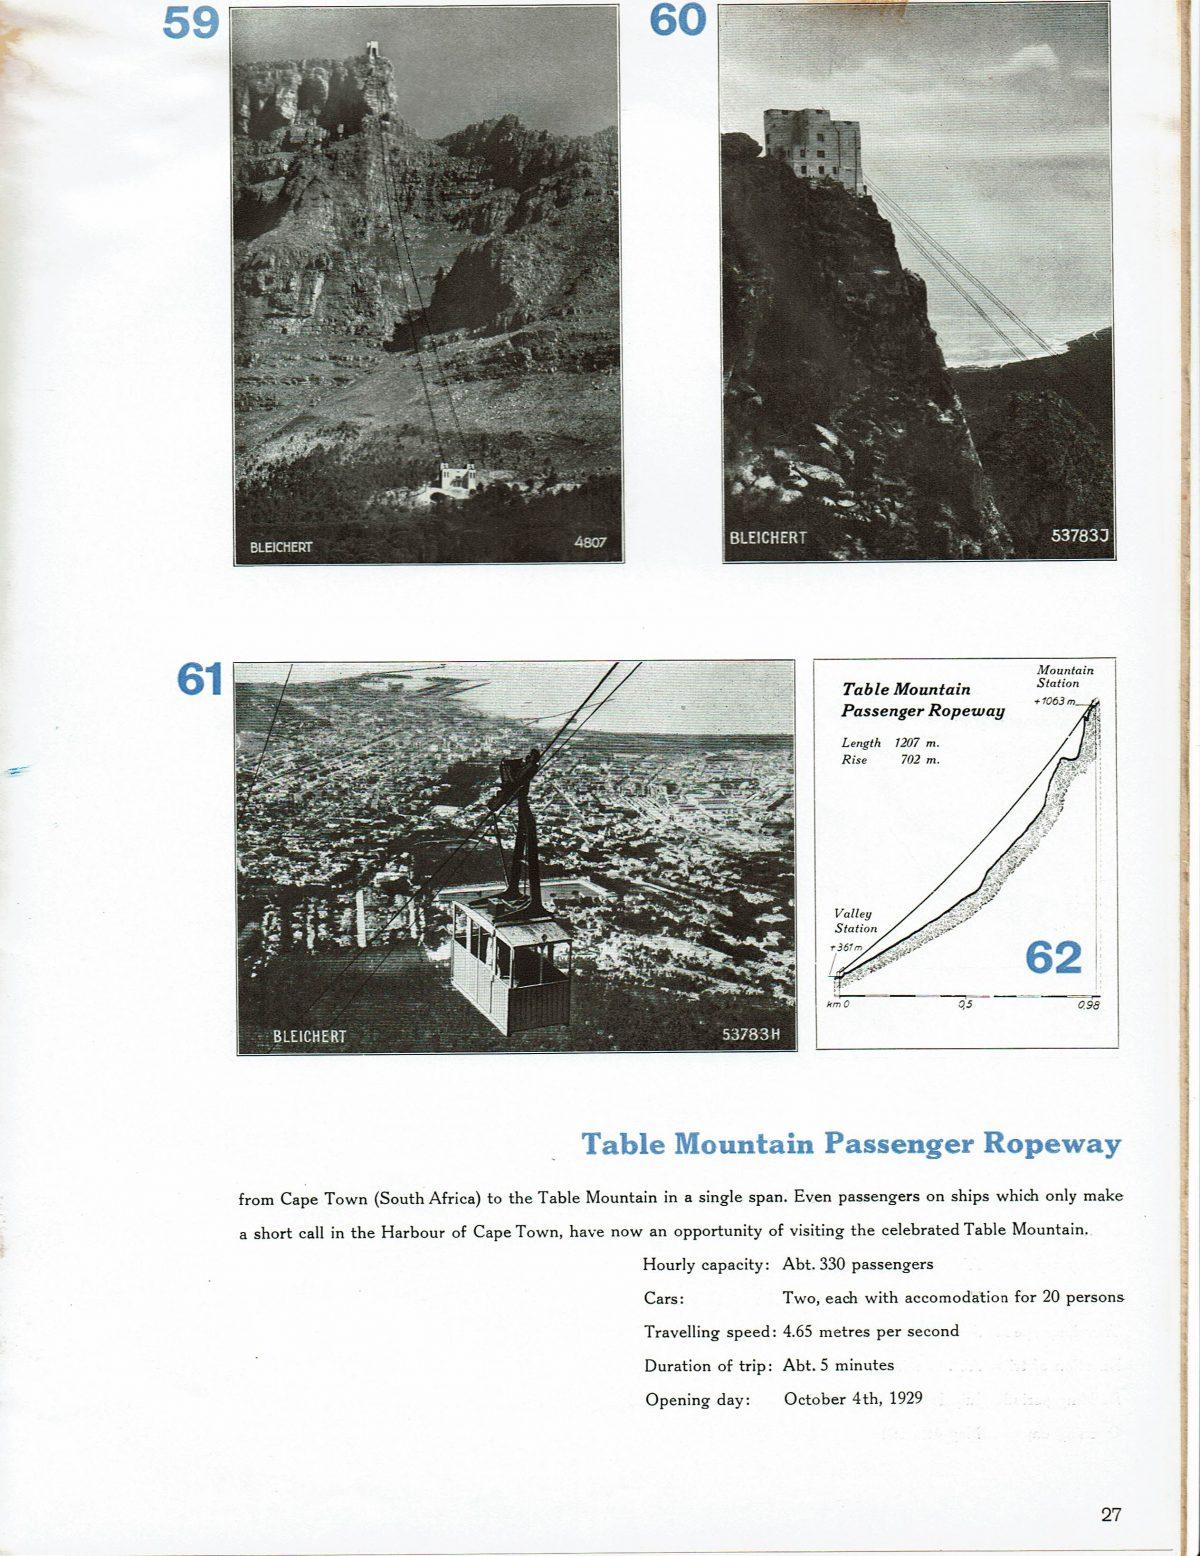 1933 Bleichert Passenger Arial Ropeways 24